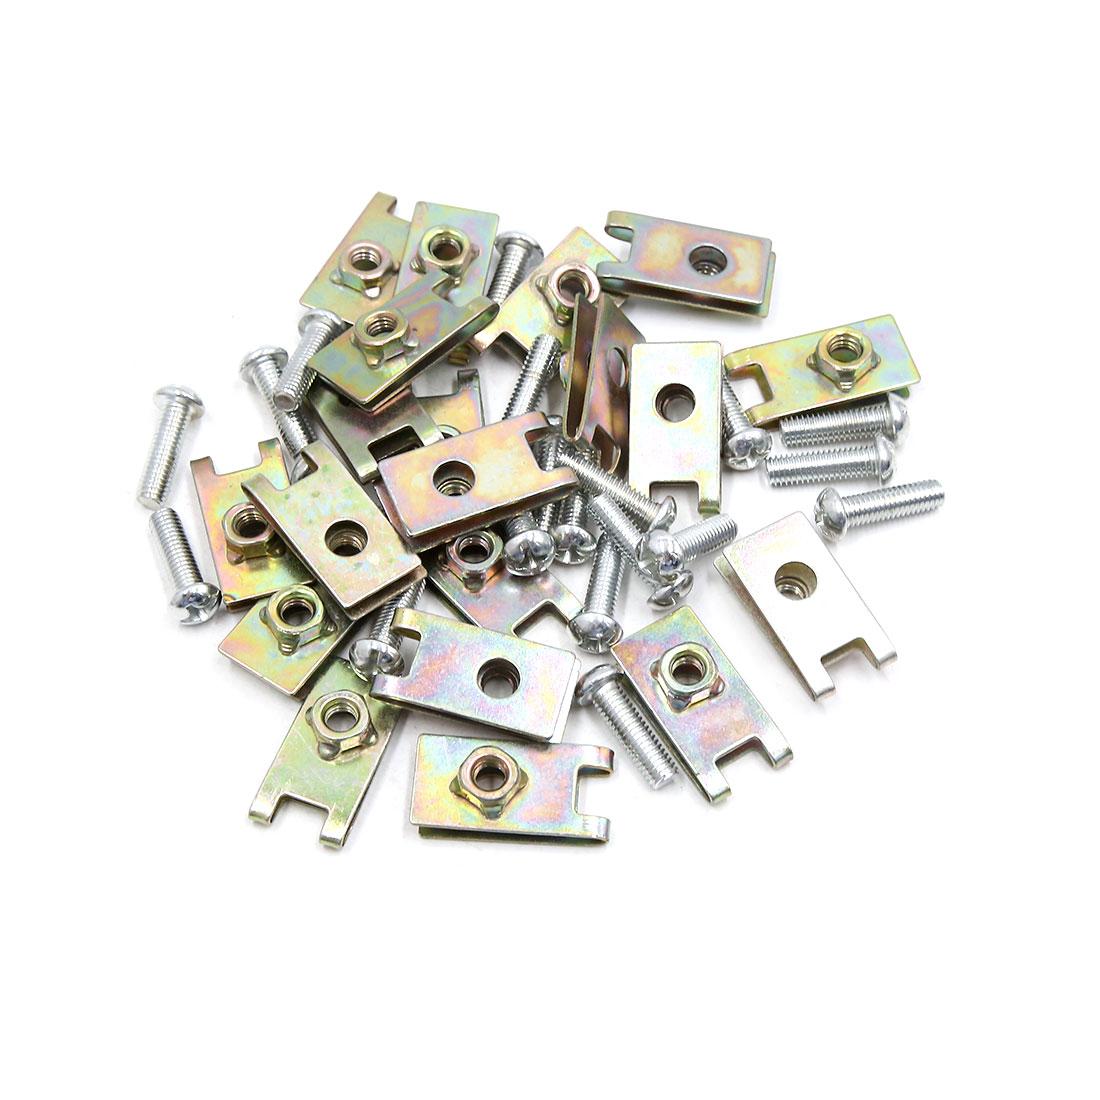 20PCS 6mm Thread Dia Universal Car License Plate Fairing Fixing Clip Kit w Screw